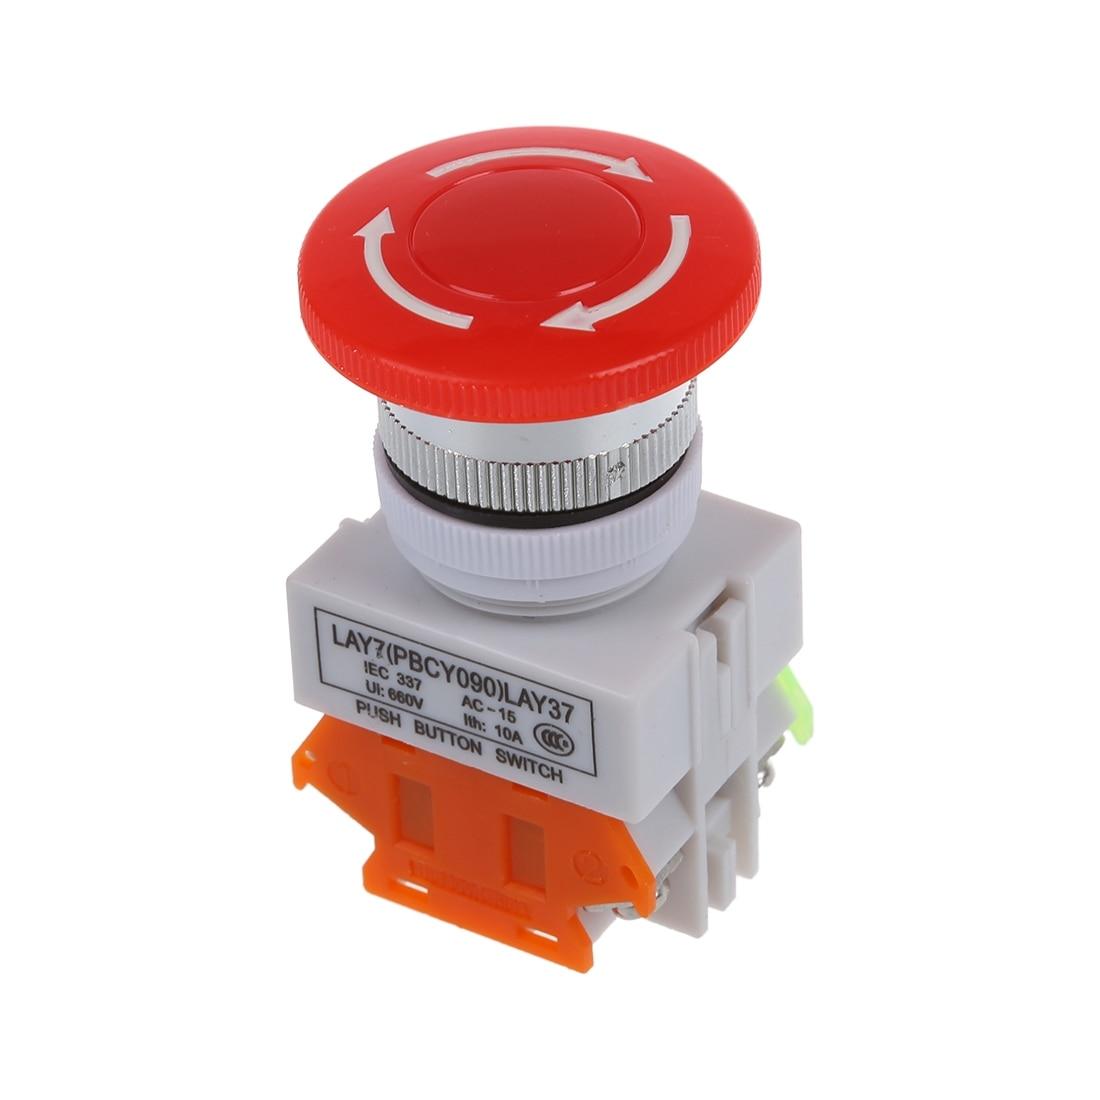 Ui 600V Ith 10A Switch Emergency Stop push button Mushroom